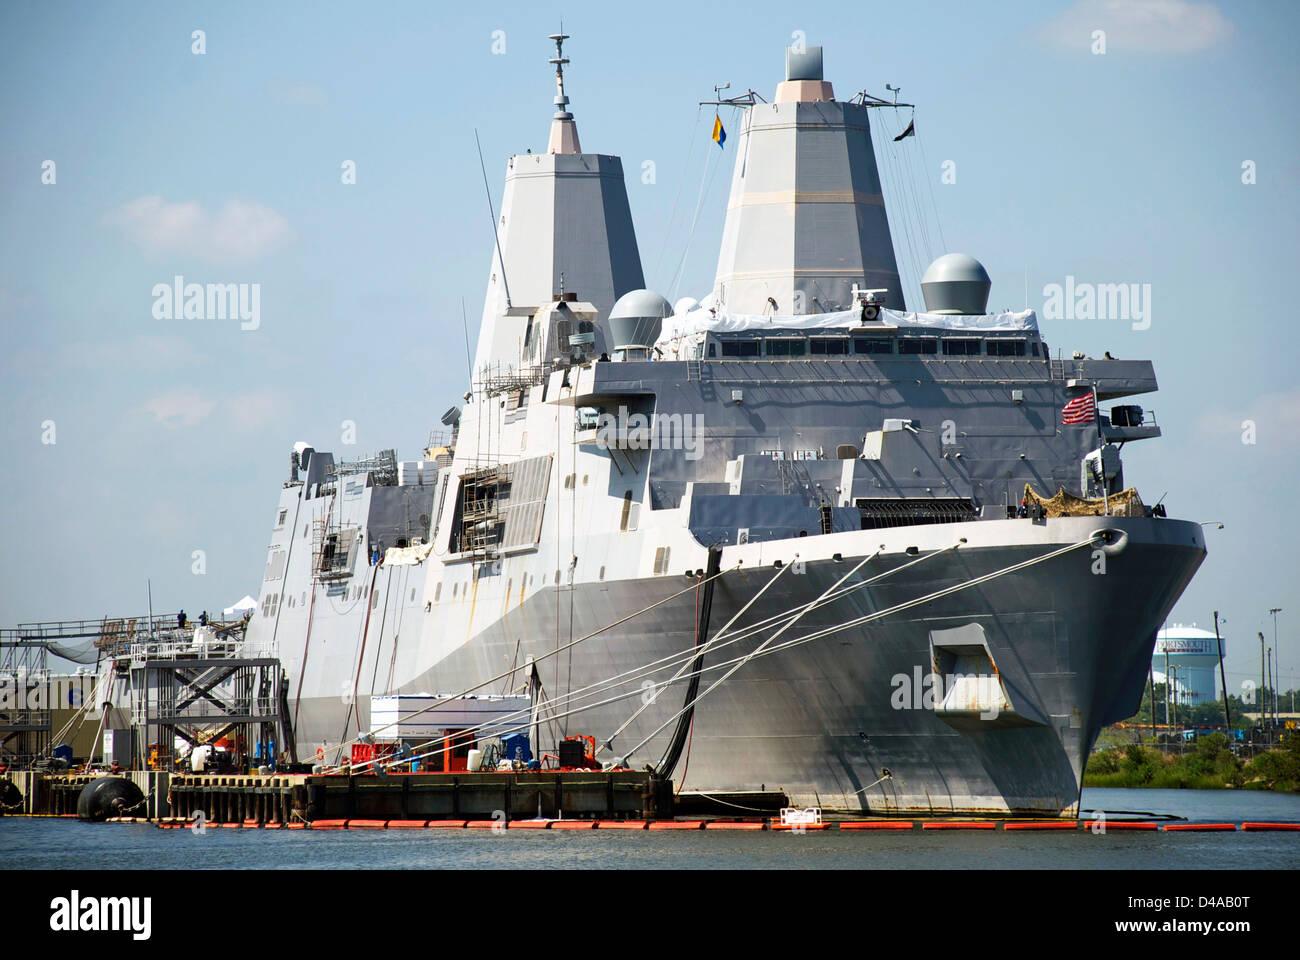 The USS San Antonio (LPD 17), an amphibious transport dock ship, undergoes repairs at a Portsmouth, Virginia, shipyard. Stock Photo